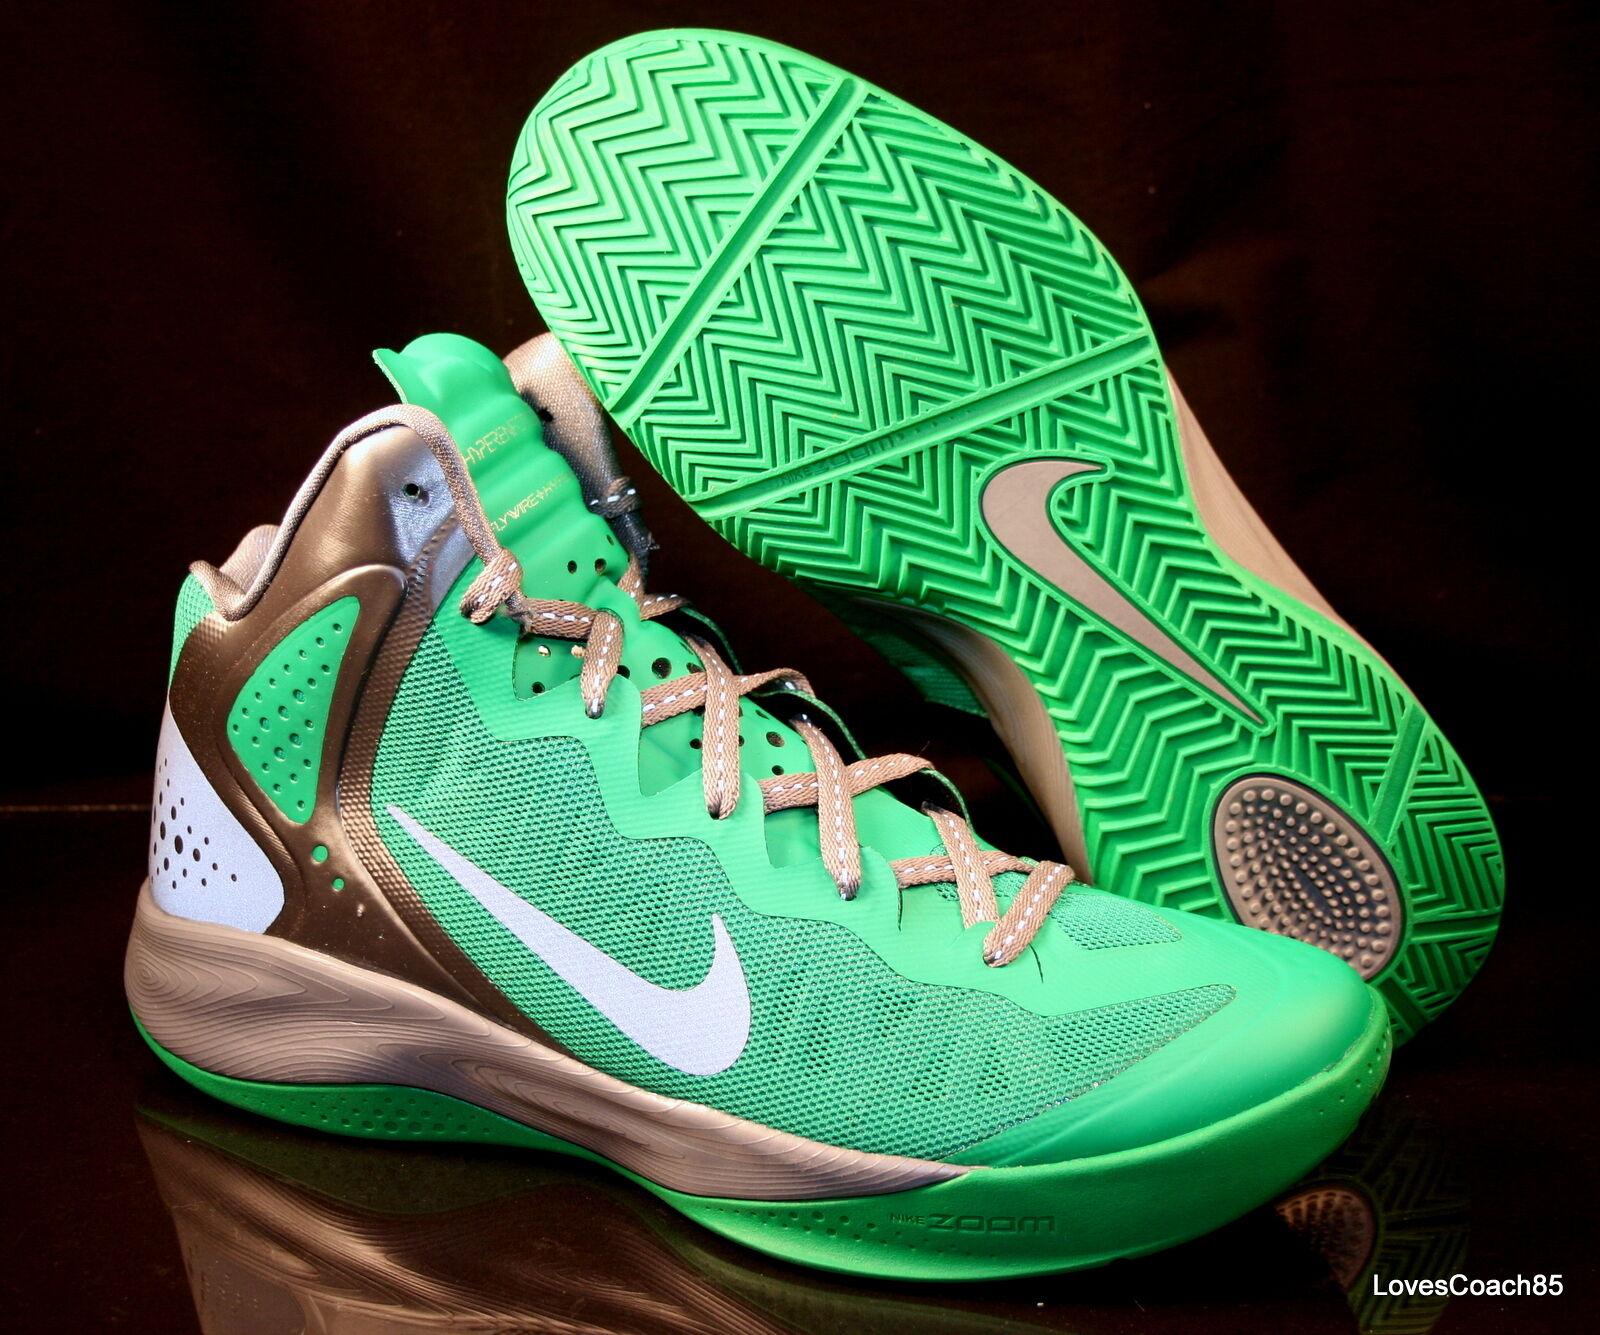 Nike Zoom Hyperenforcer PE Men's Basketball Shoes Lucky Green 487655-300 NIB DS